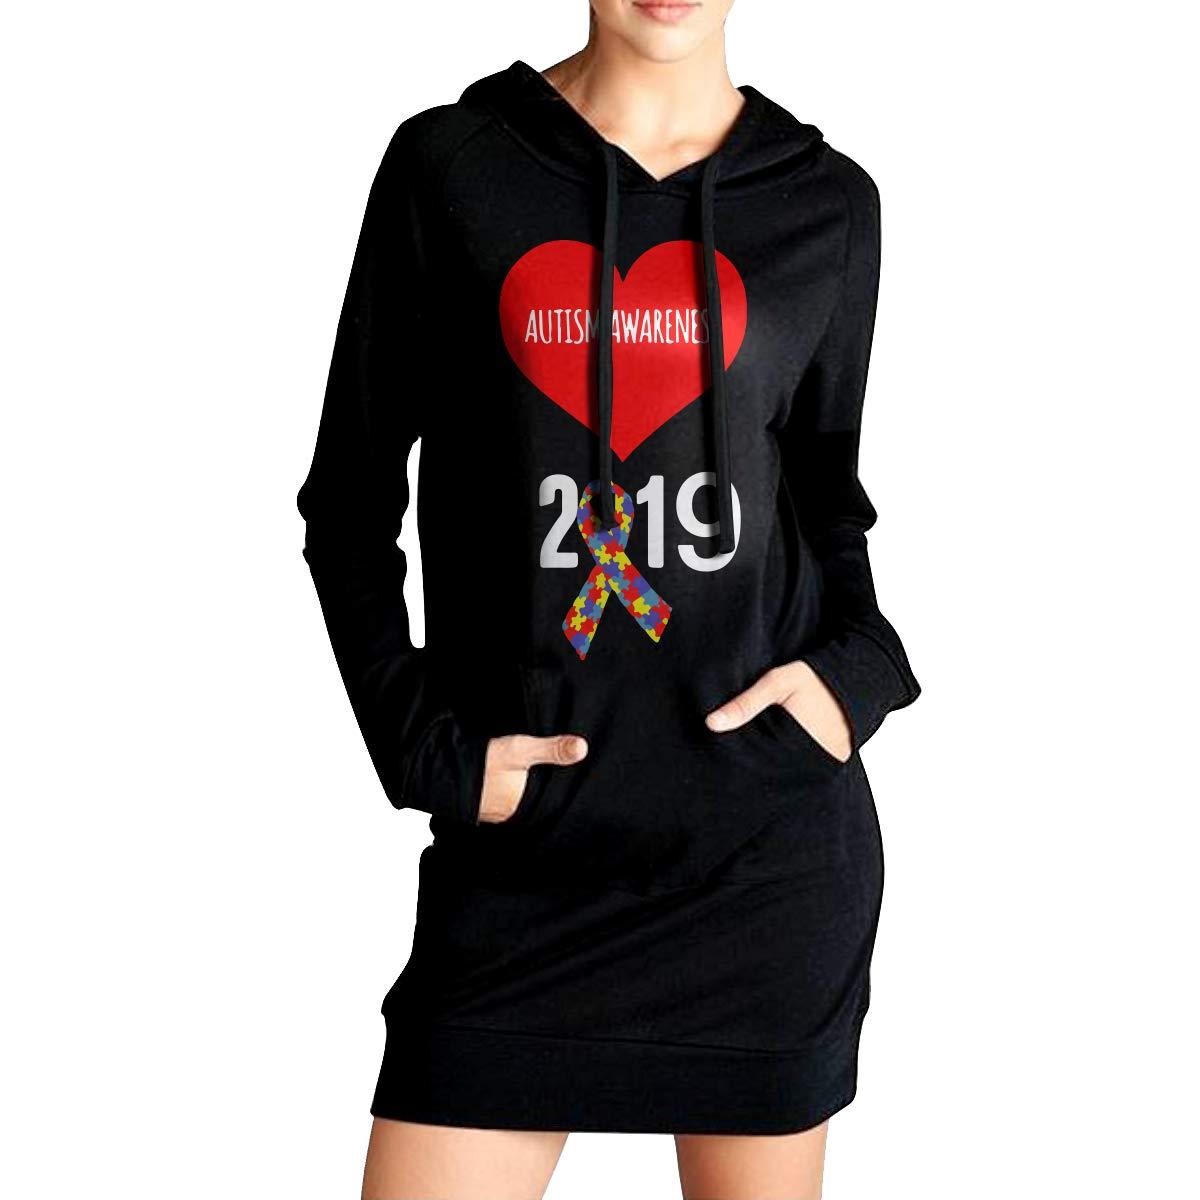 Sportswear with Pockets NVWEIYIJW Autism Awareness 2019 Womens EcoSmart Sweatshirt Long Hoodie Dress